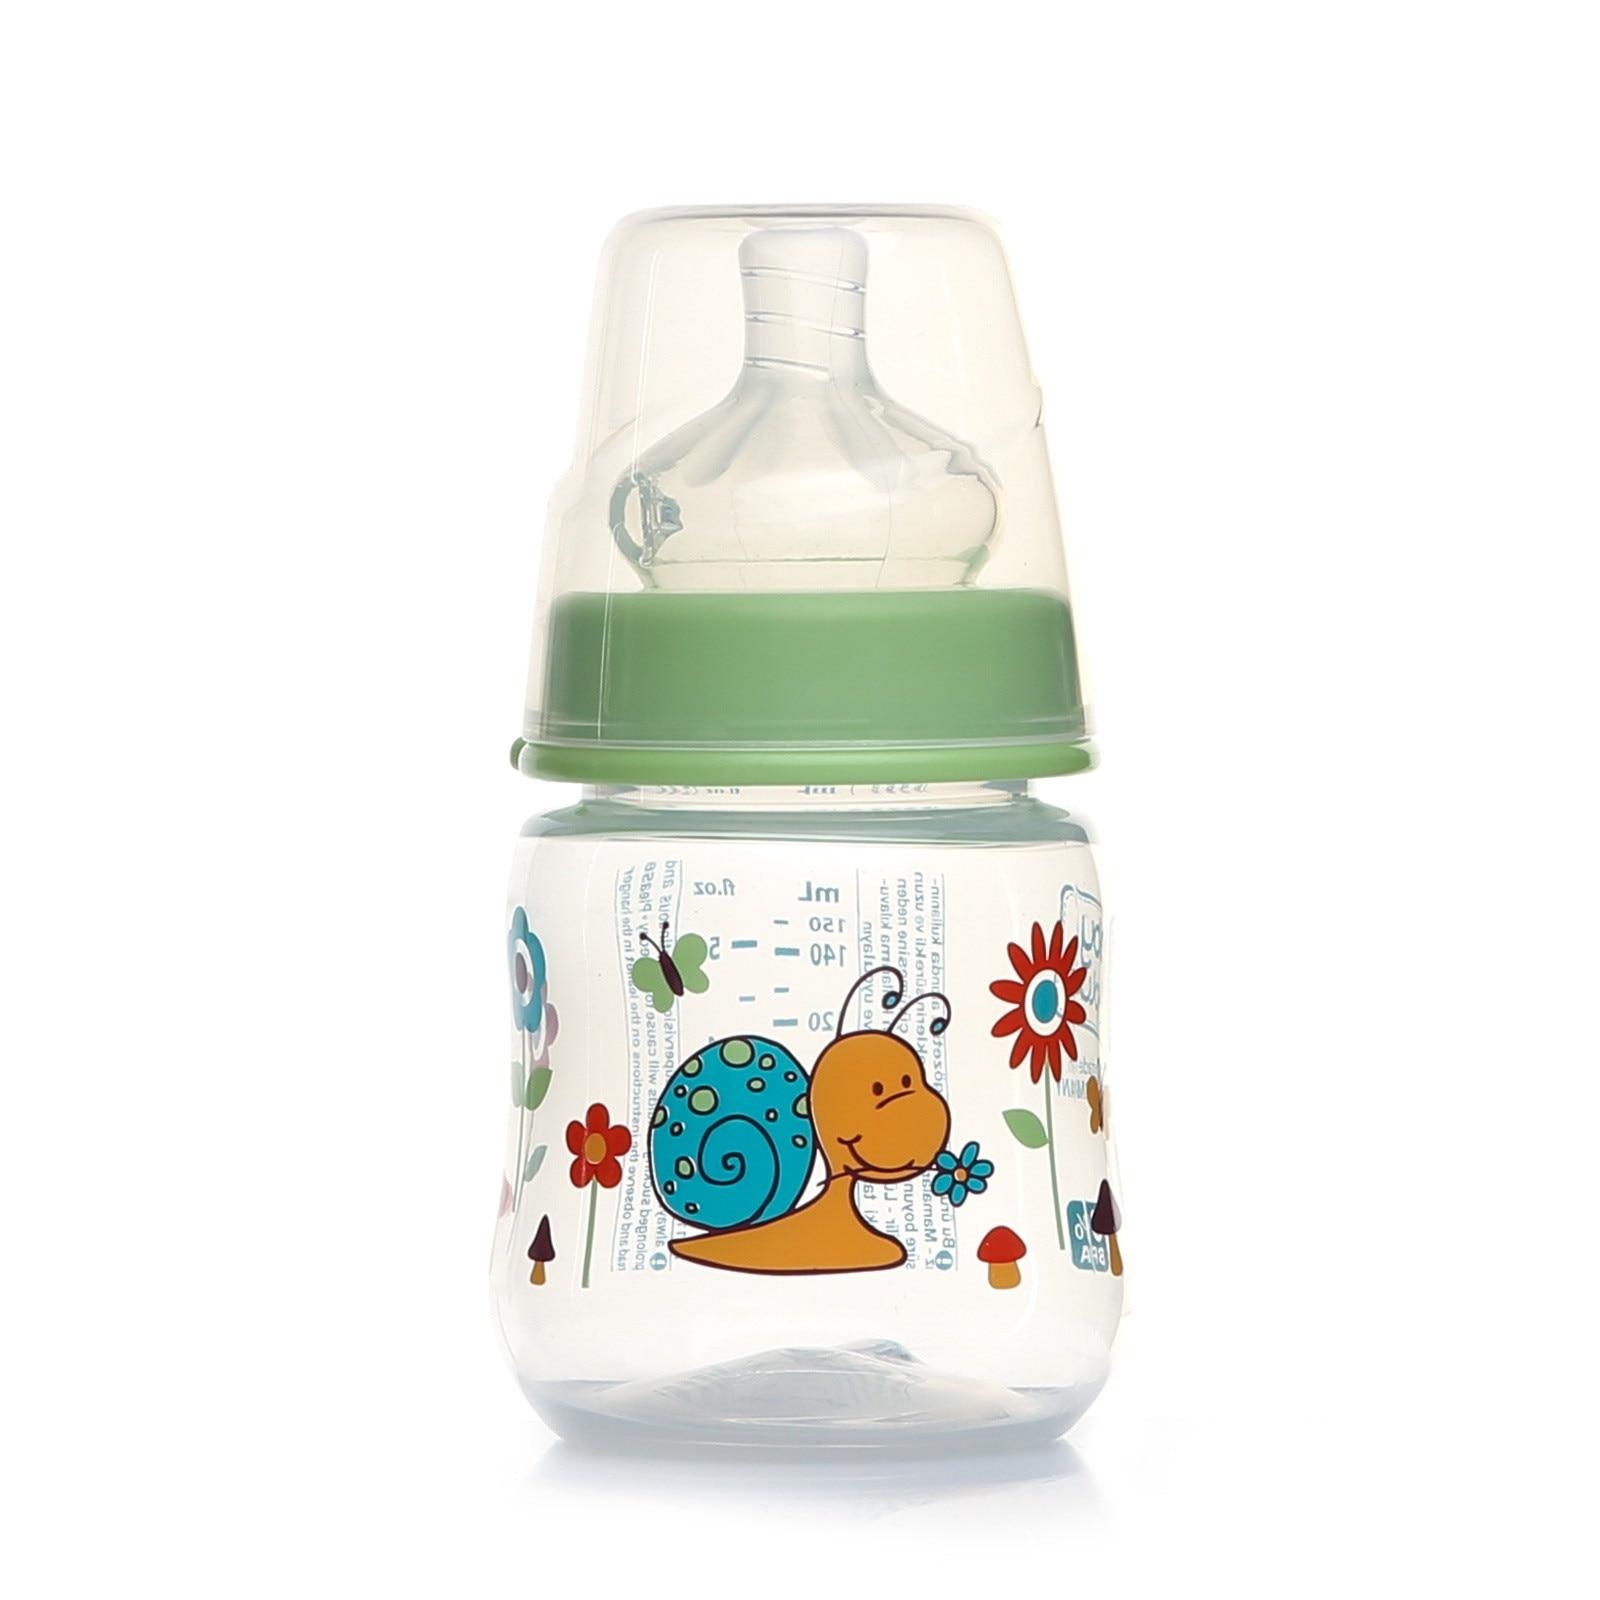 Ebebek Baby&plus Wide-Neck PP Bottle 150 Ml